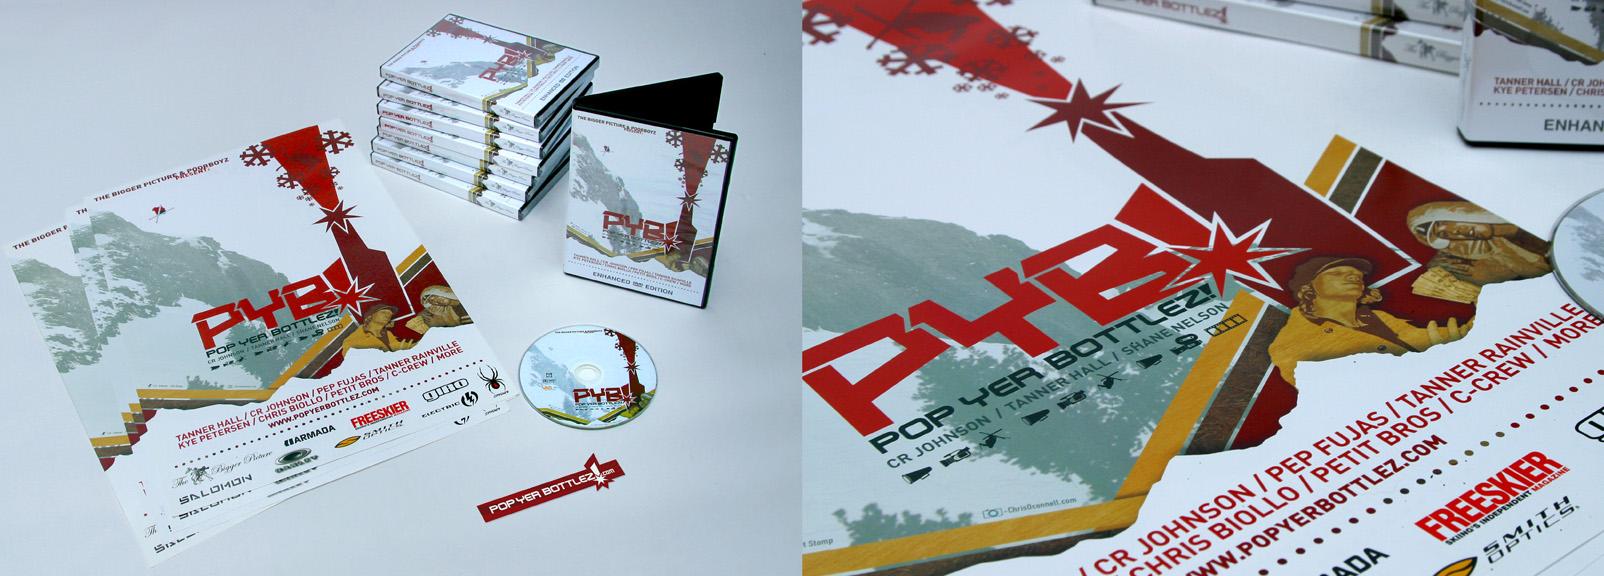 Pop Yer Bottlez! - Feature Ski Film - Dir. Shane Nelson - Packaging and marketing material design - Shane Nelson